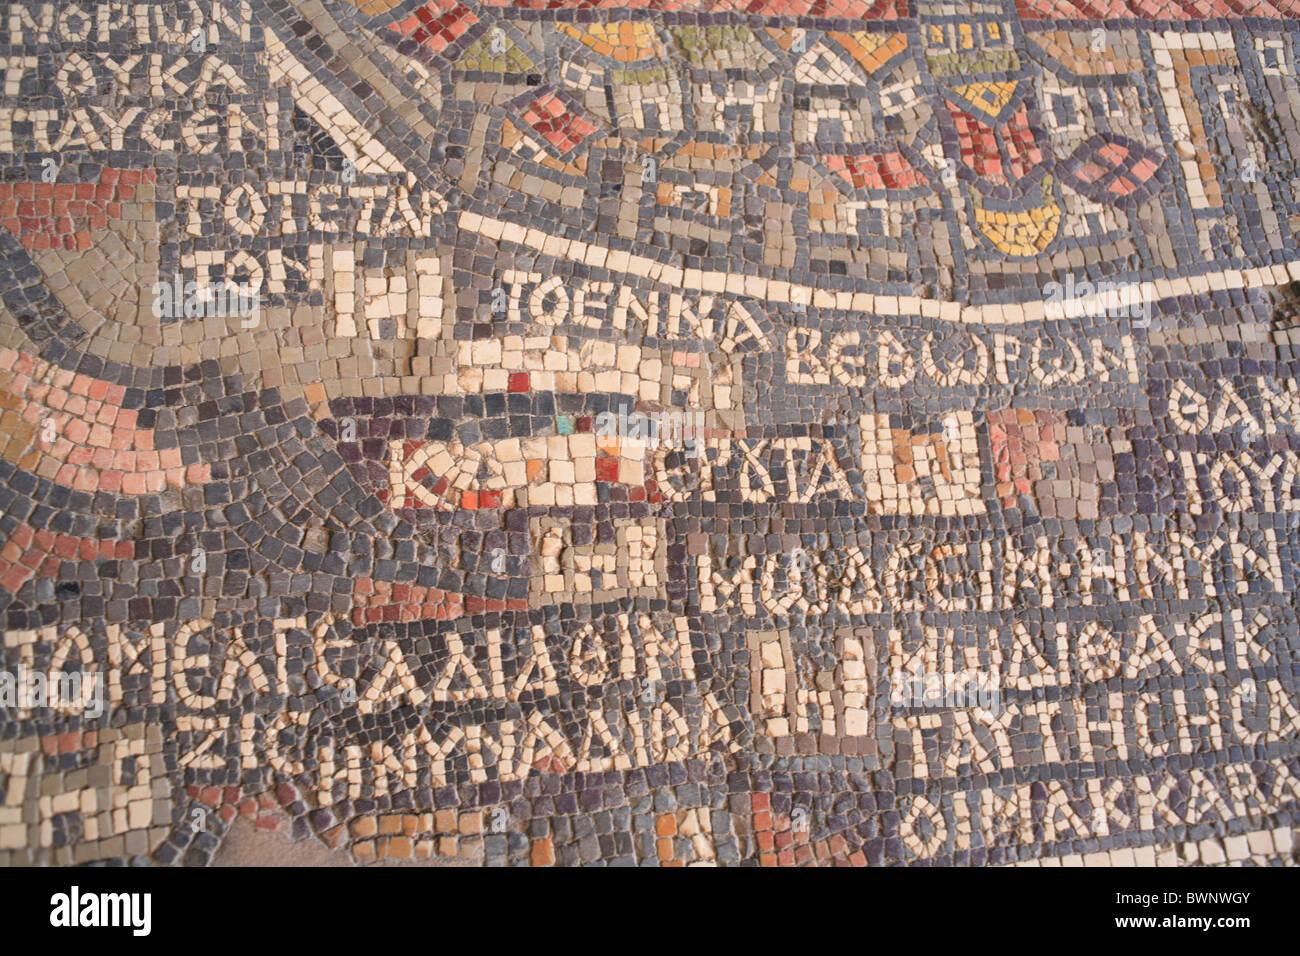 Madaba Jordan Mosaic map Holy Land St. George greek Orthodox church Middle East Oriental Ancient Old Art ar - Stock Image